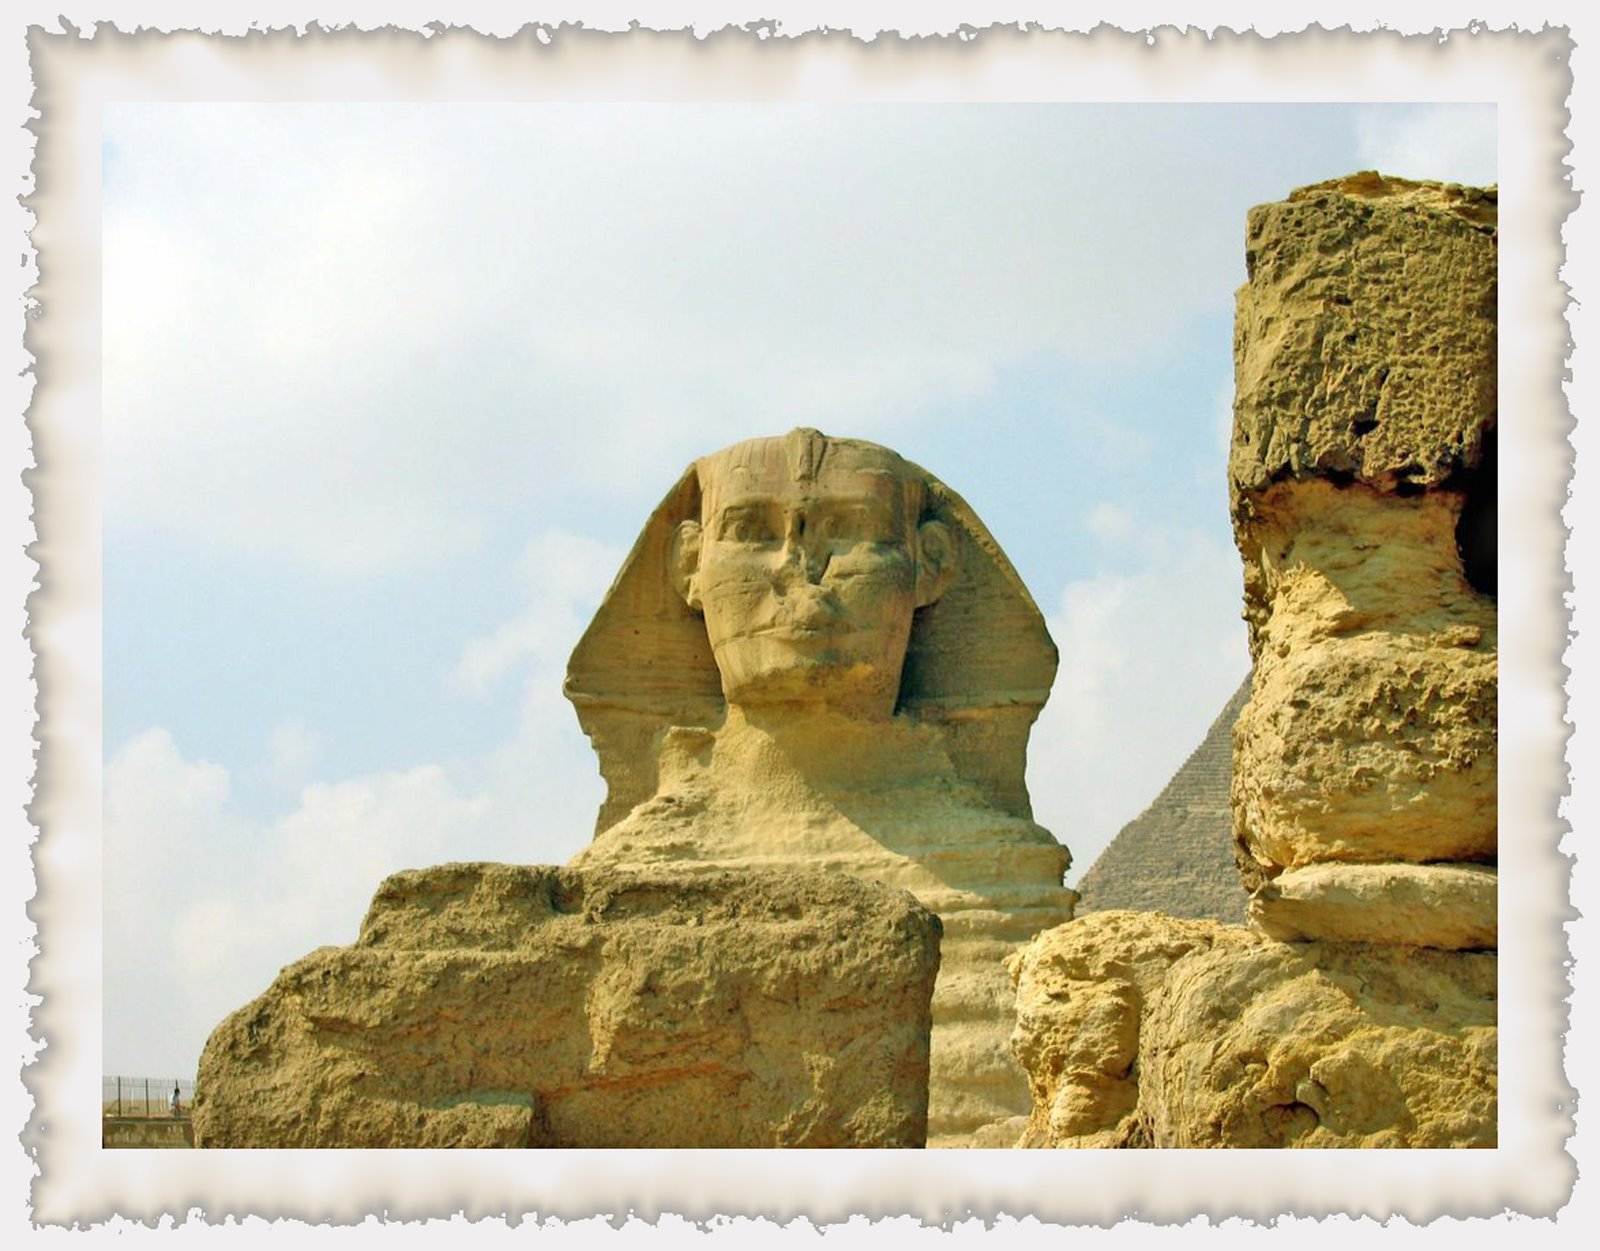 [SFIGA+EGYPTOS++MIKRO.jpg]